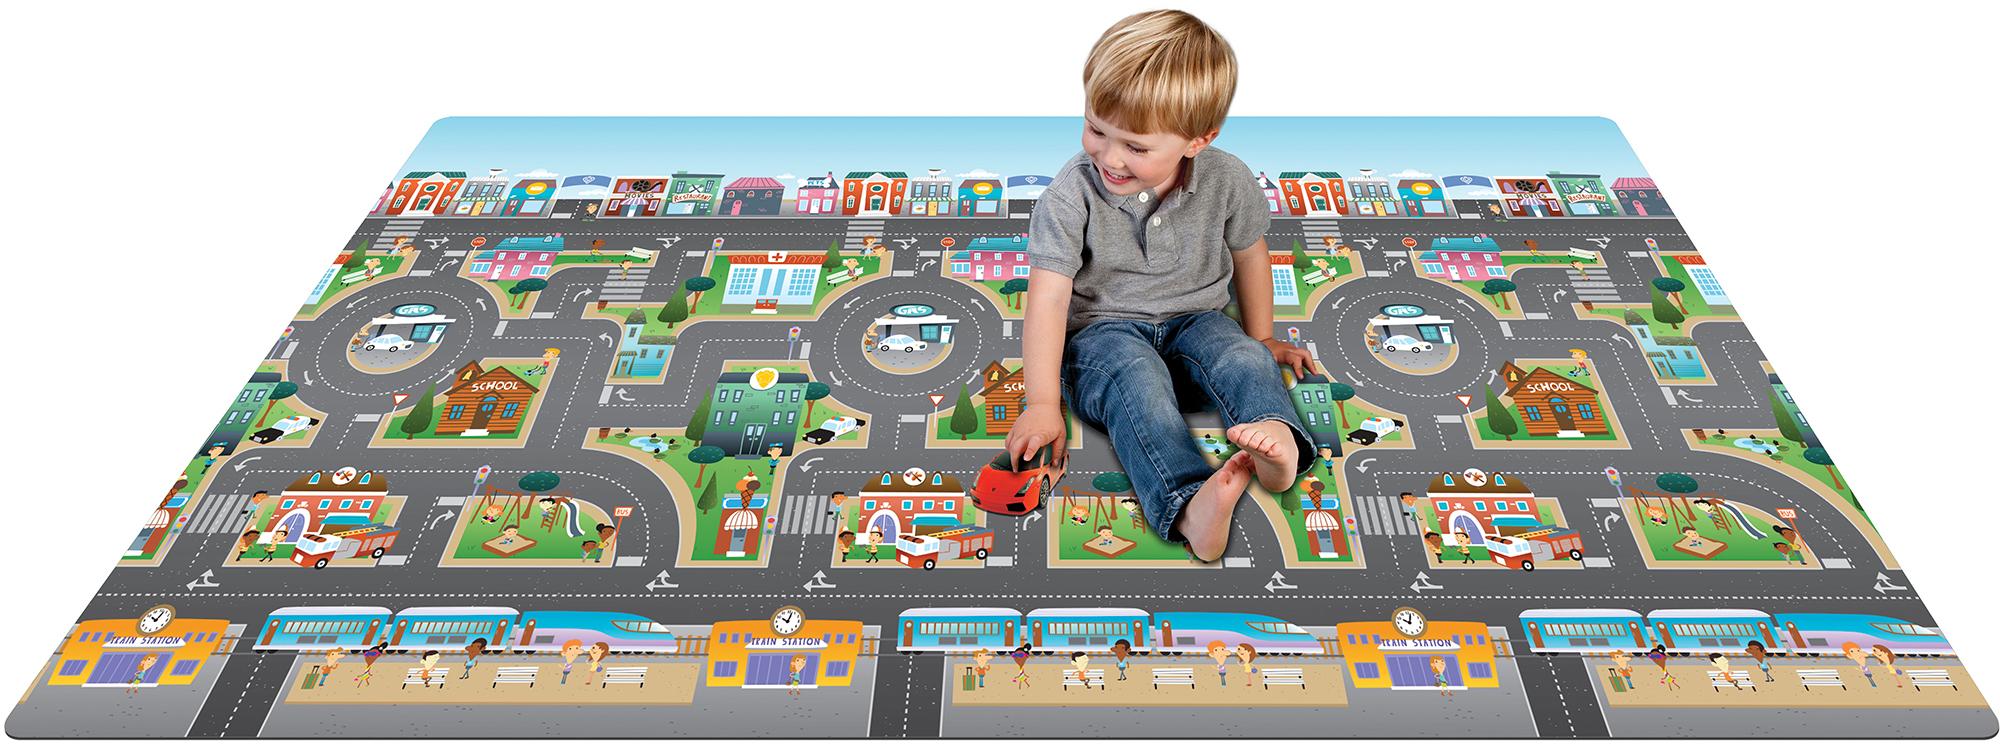 prince lionheart play mat city  abcdinosaurfarm toddlerchild  - thumbnail